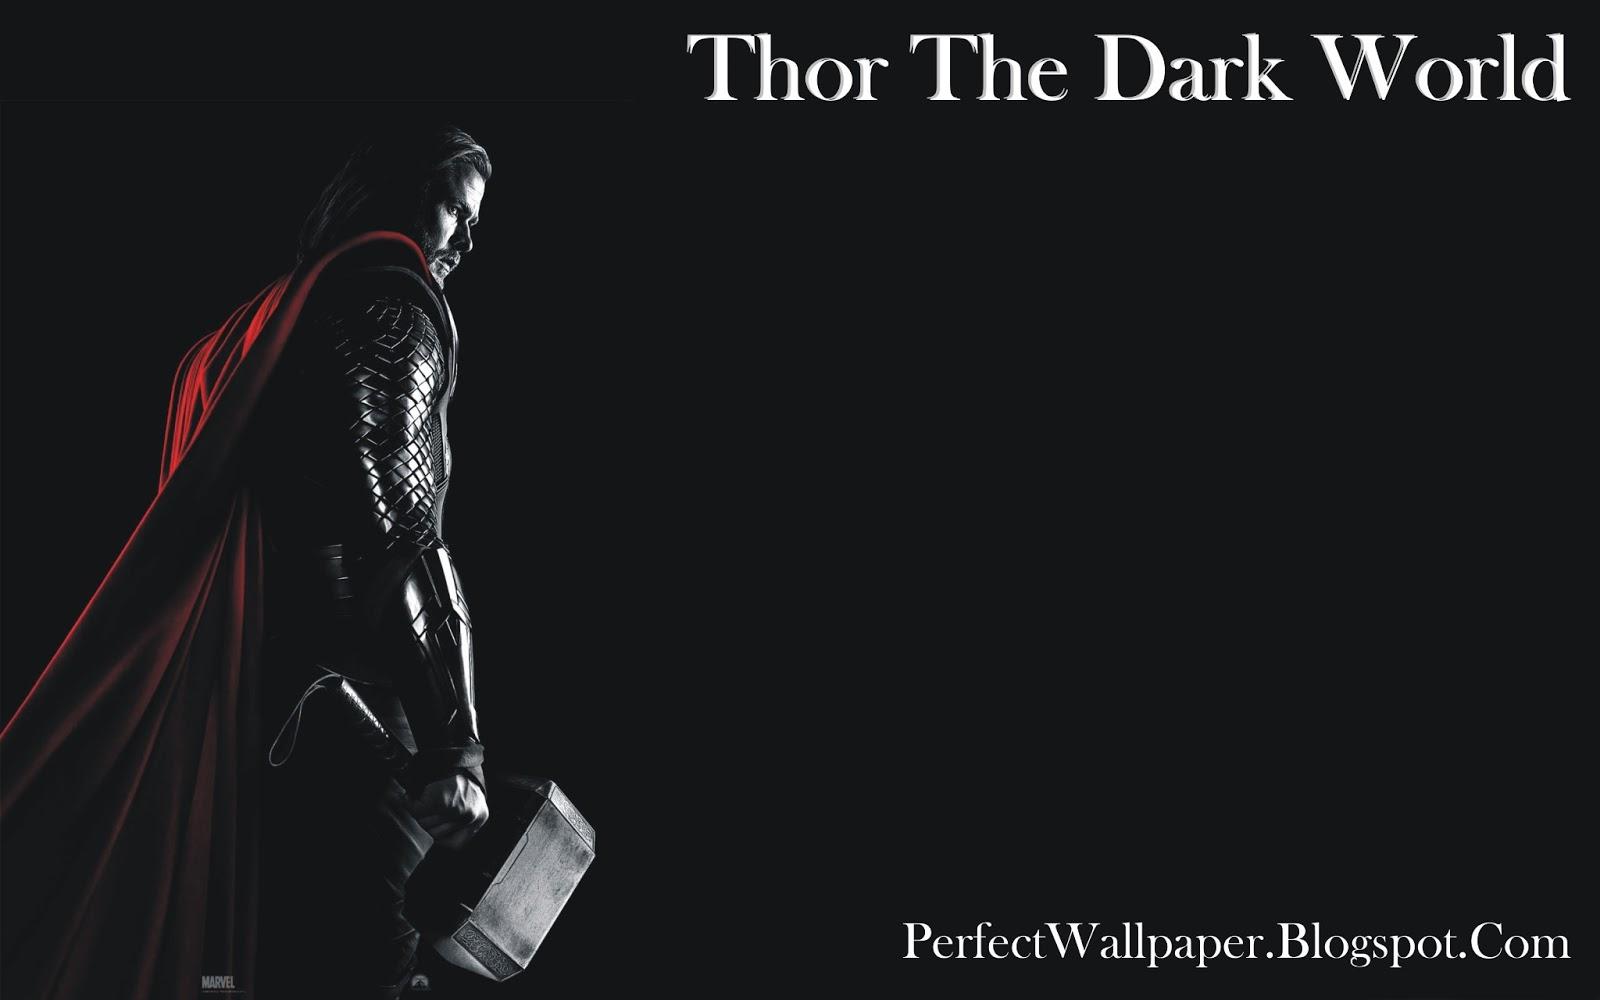 thor the dark world wallpaper - photo #1